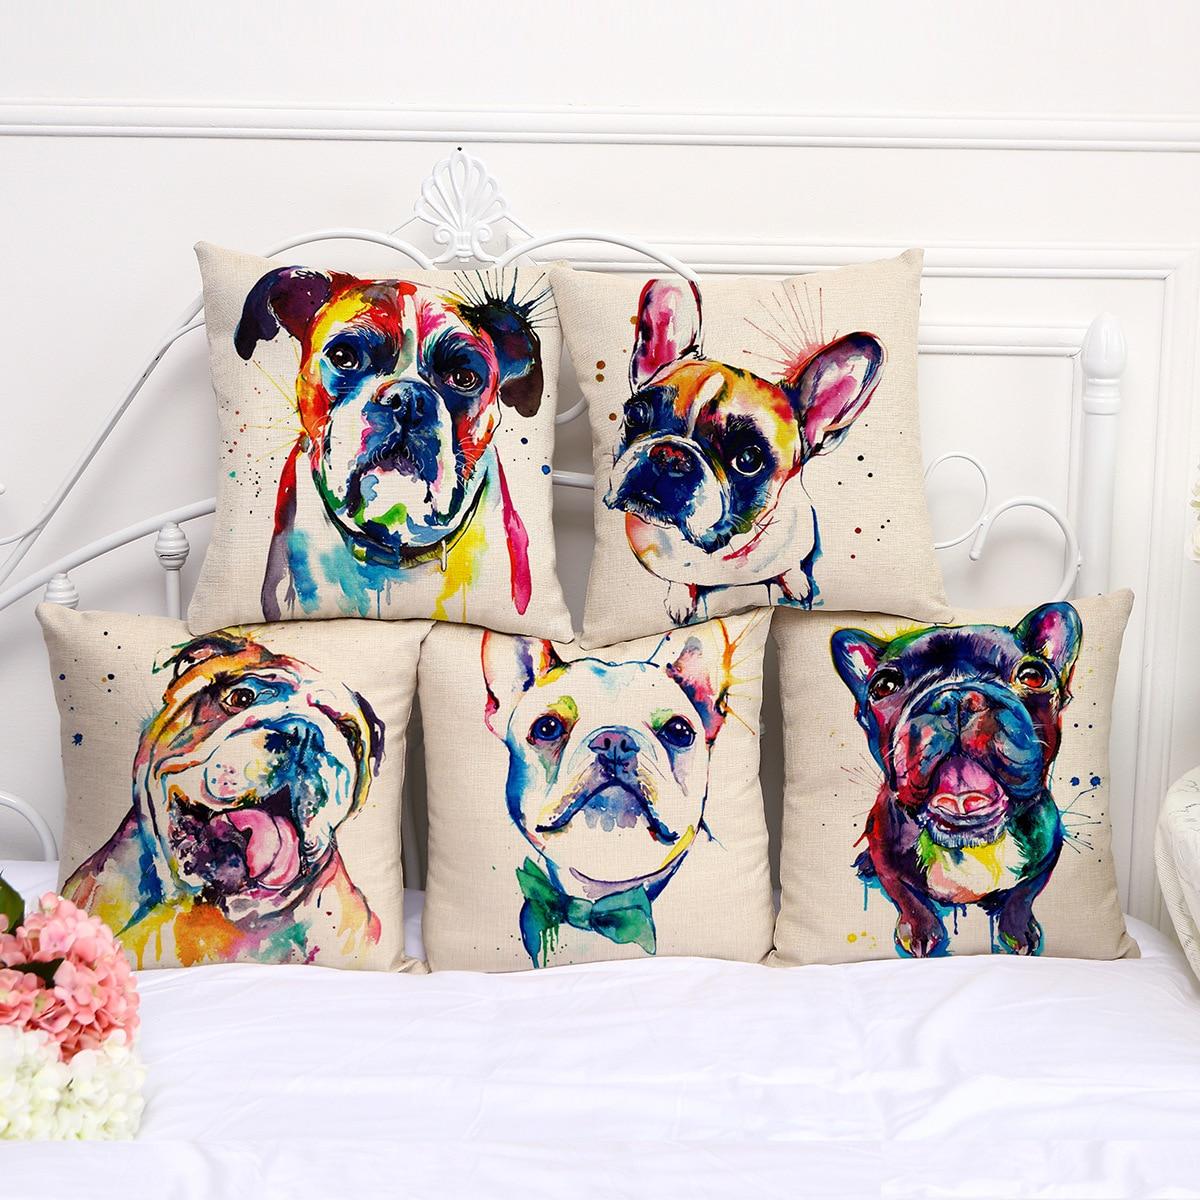 Cartoon Bulldog Printed Cushion Cover Pillowcase 45*45 Polyester Sofa Cushion Covers Pillow Cases Home Decor KD-0017